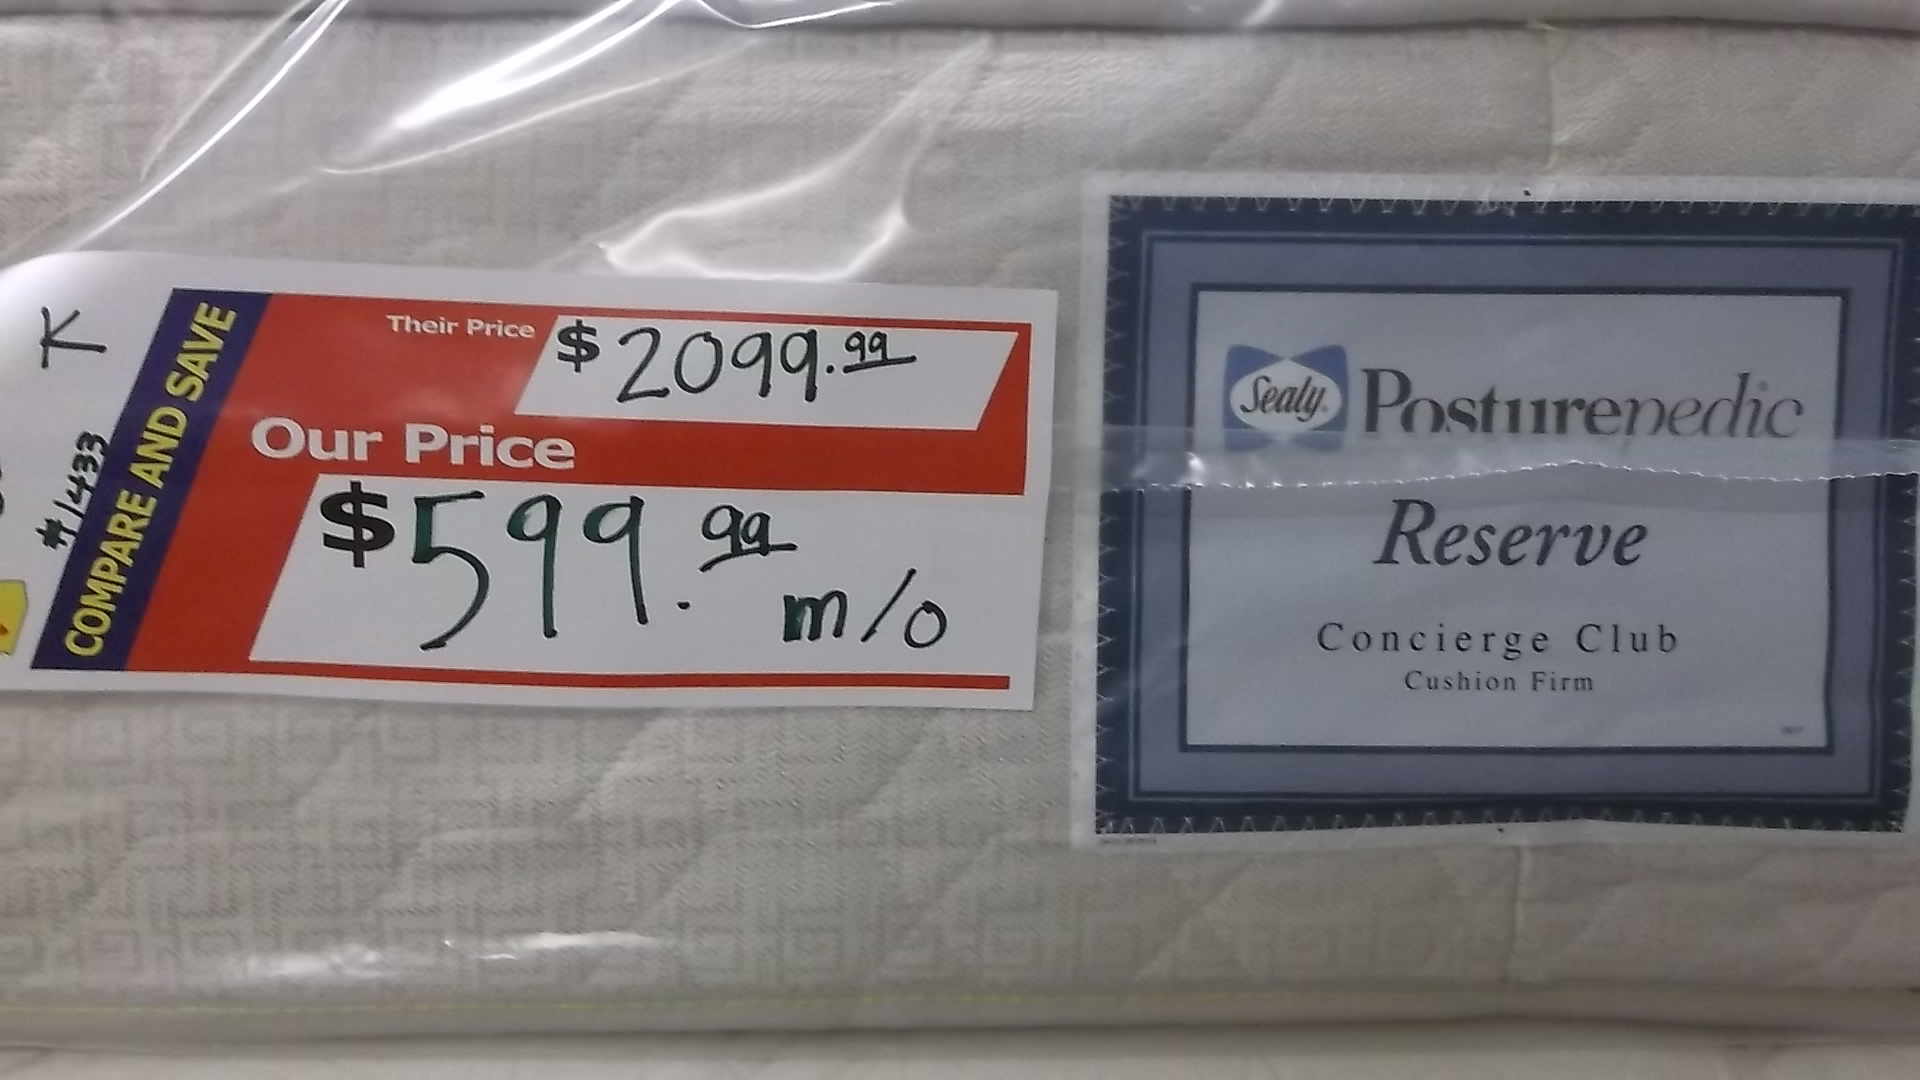 Reviews For Sealyposturepedic Sealy Posturepedic Annot Plush Mattress Bed Mattress Sale